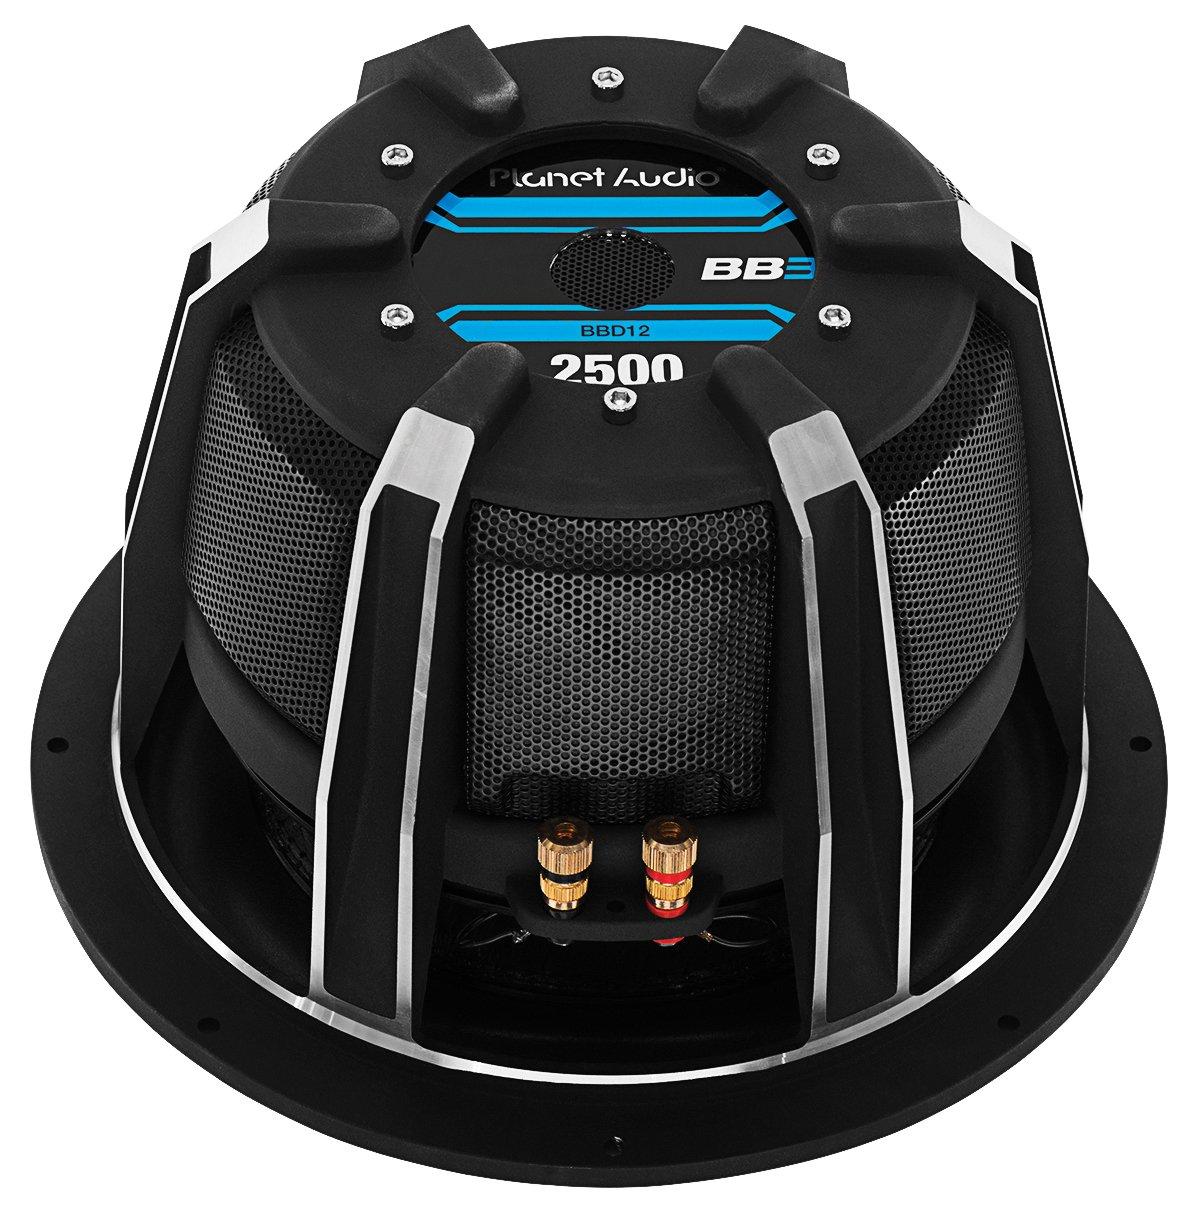 Amazon.com: Planet Audio BBD12 2500 Watt, 12 Inch, Dual 4 Ohm Voice ...